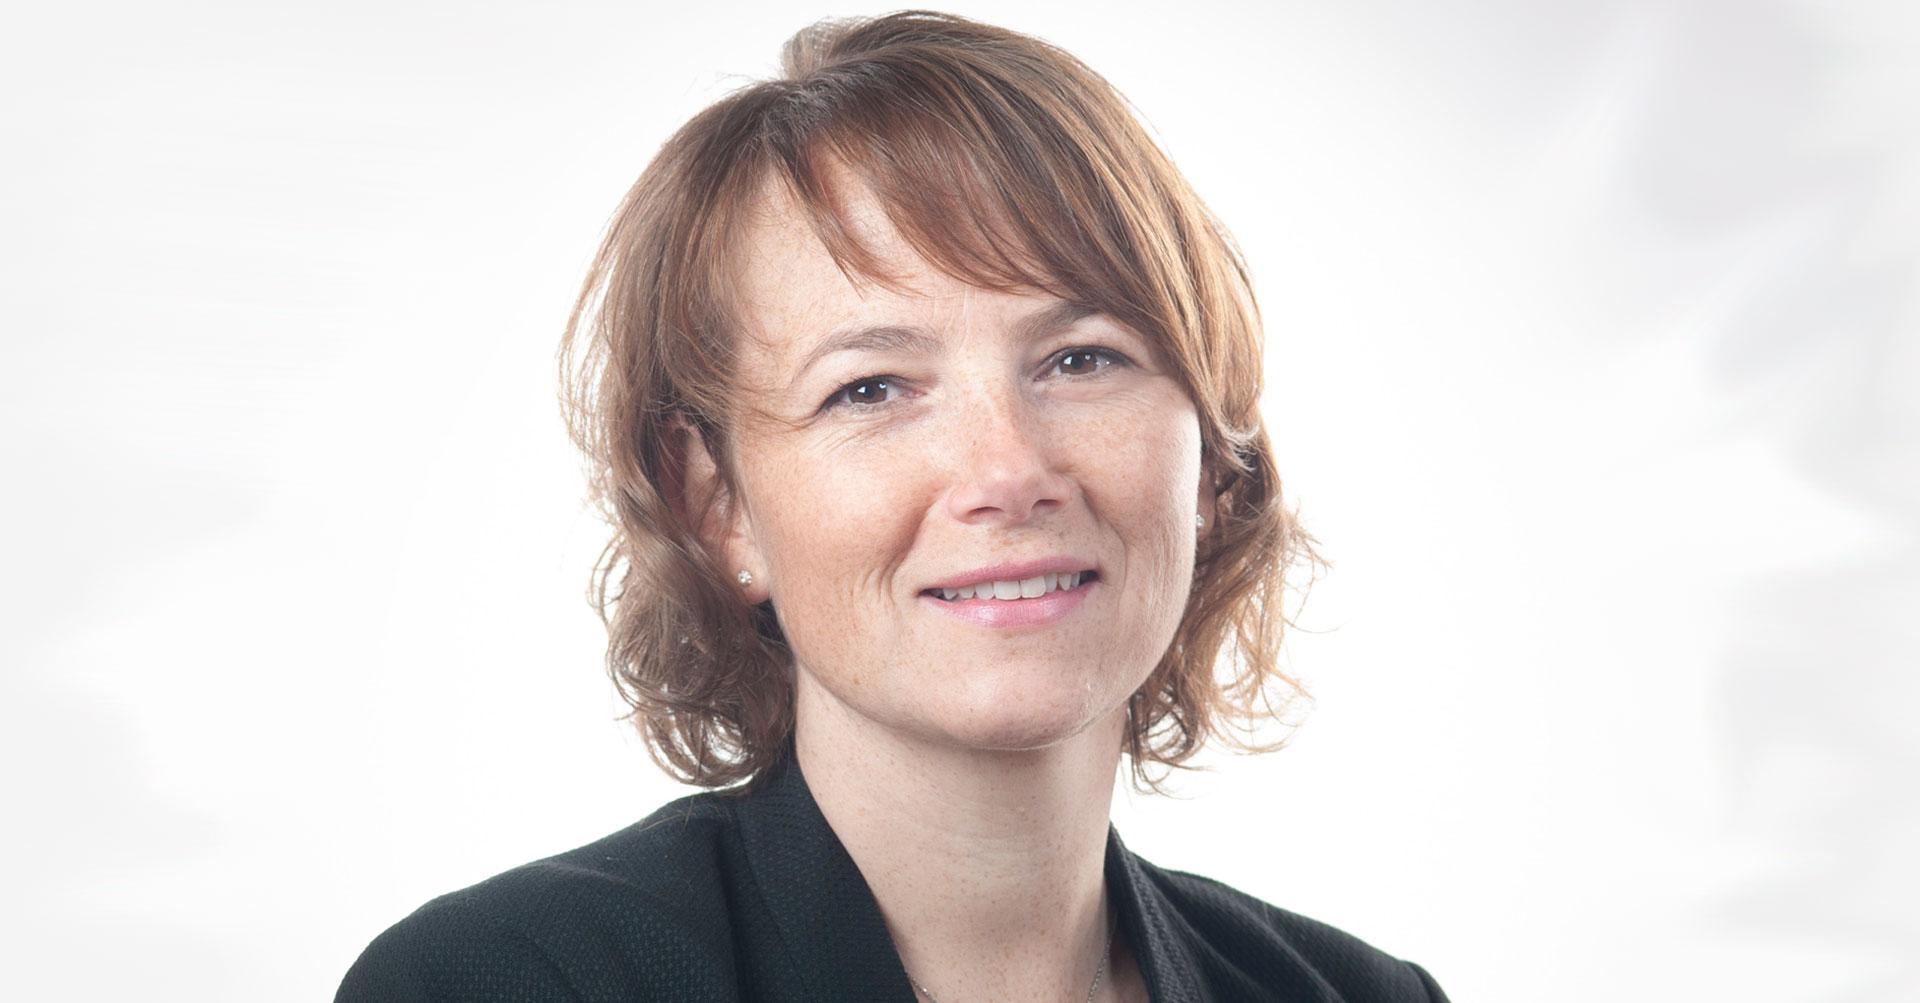 Céline Lechowicz